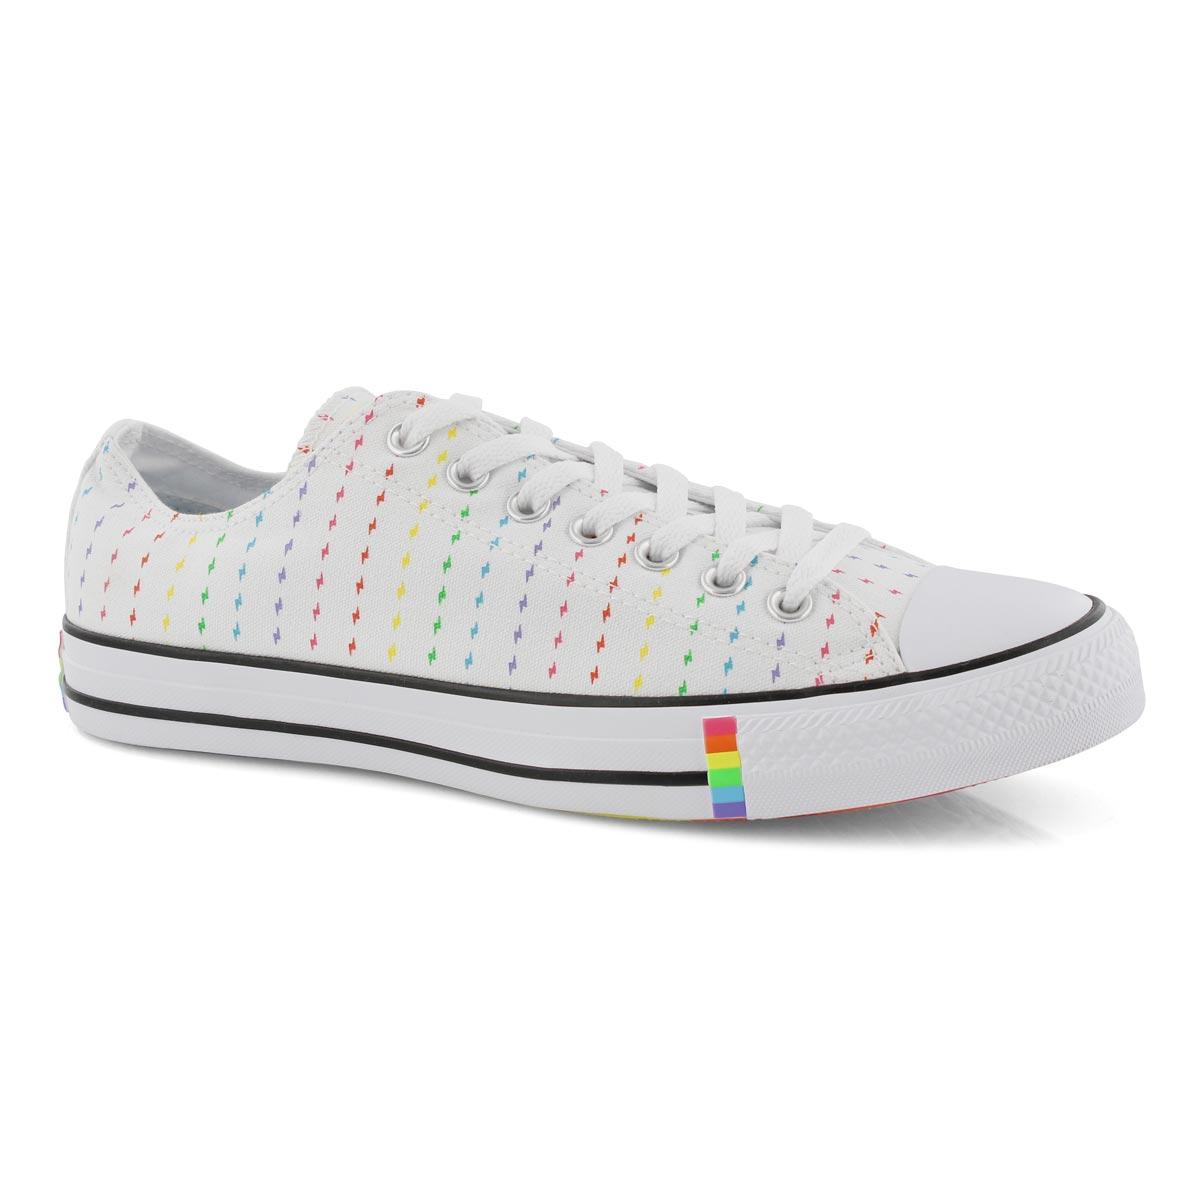 Mns CTAS Rainbow Pride Ox wht/mlt snkr